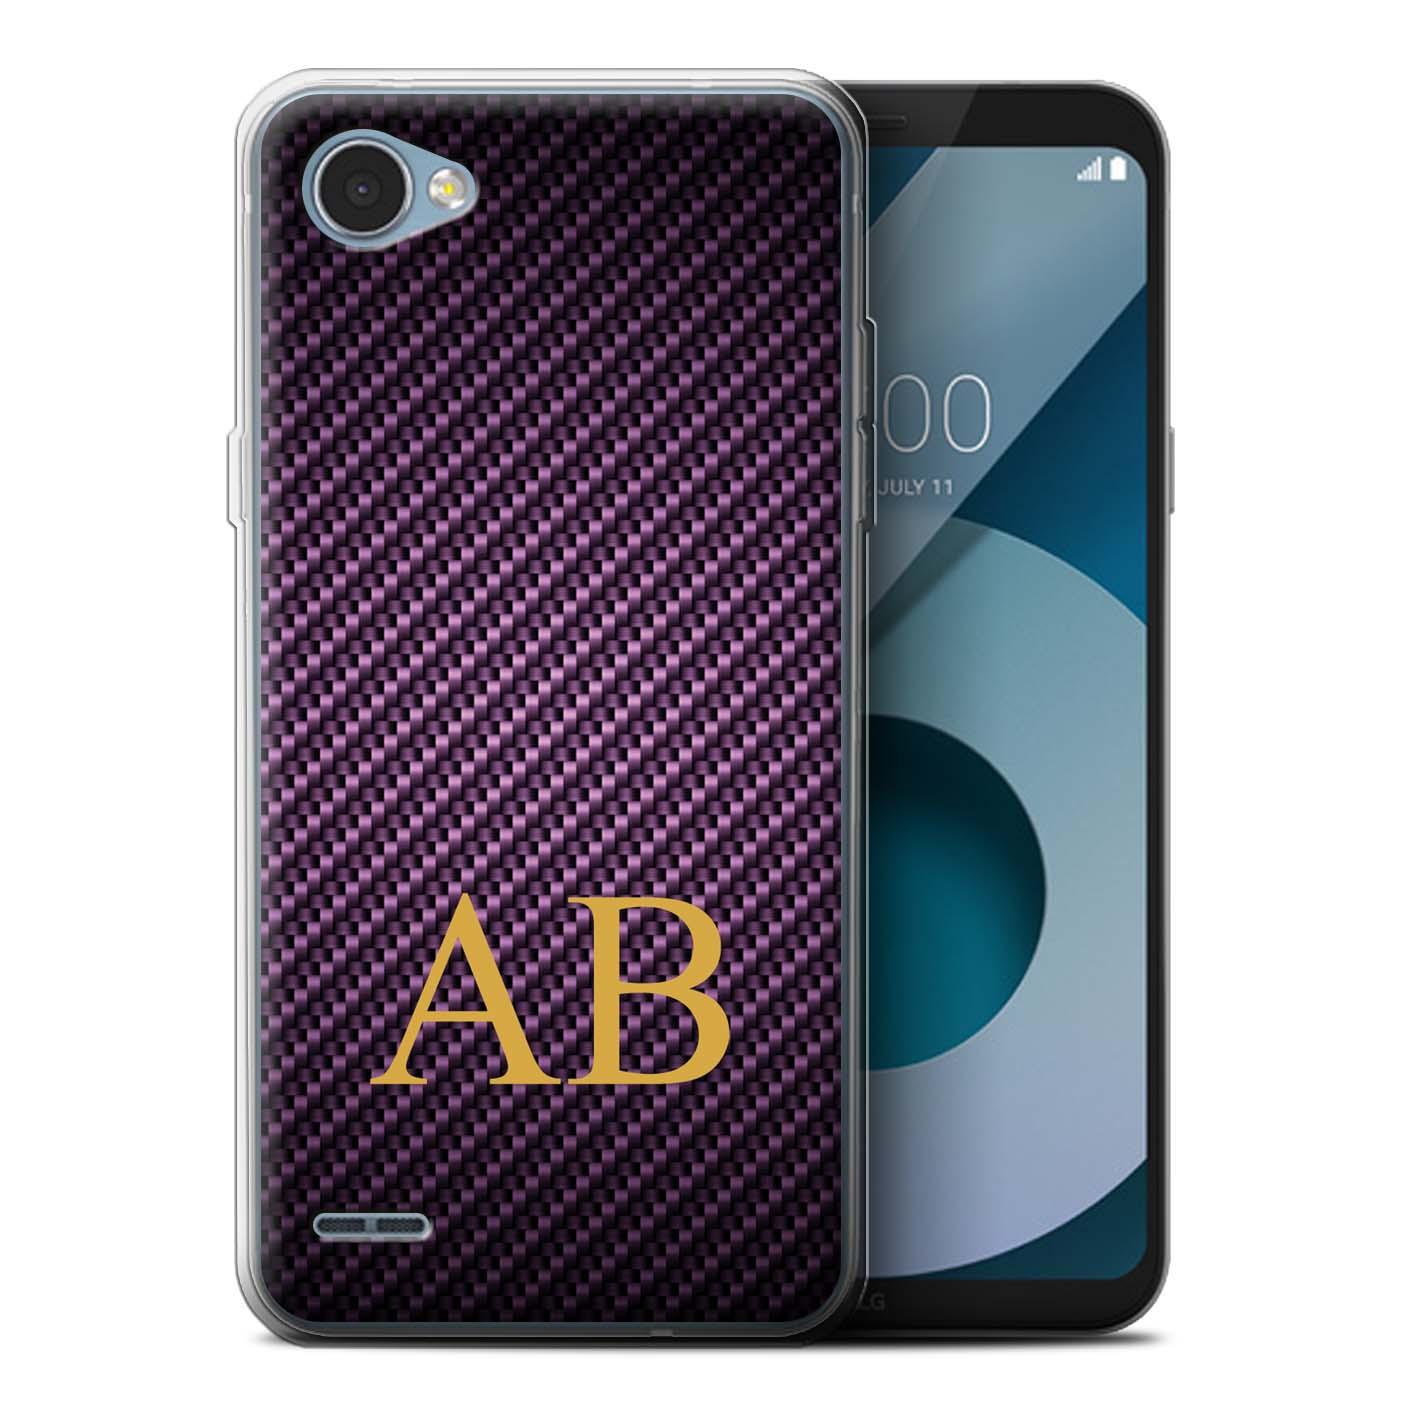 Personalised-Carbon-Fibre-Effect-Case-for-LG-Q6-M700-Initial-Name-Gel-TPU-Cover miniatuur 16